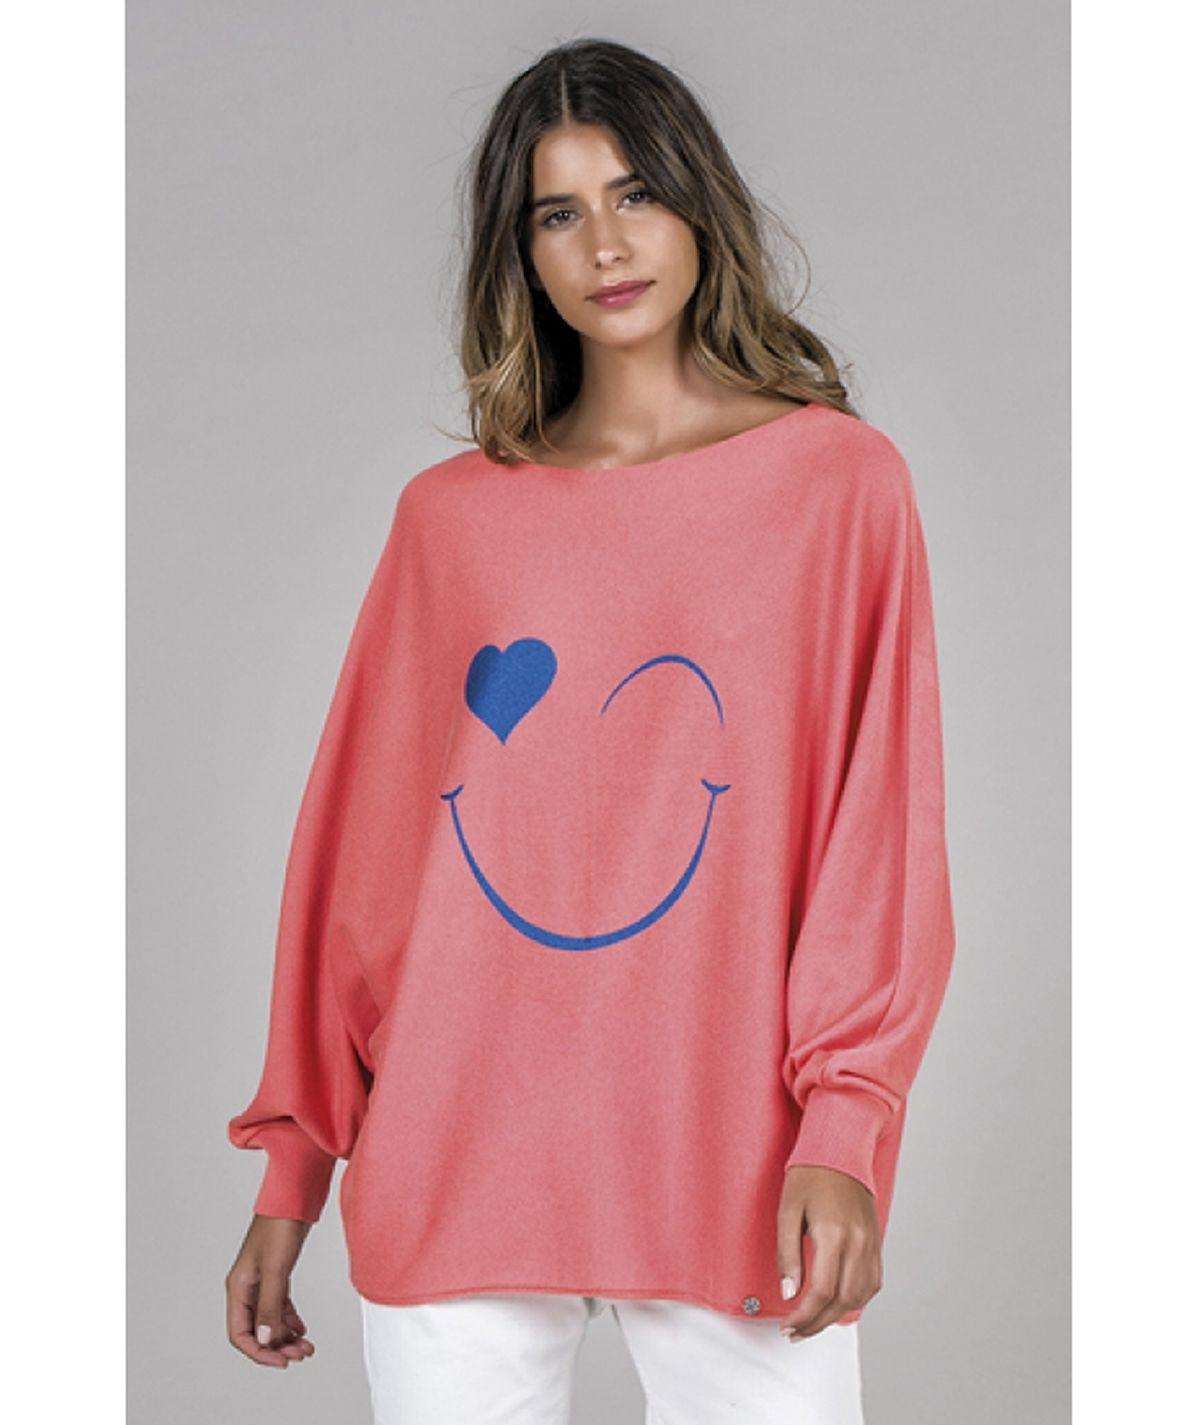 Camisola motivo smile